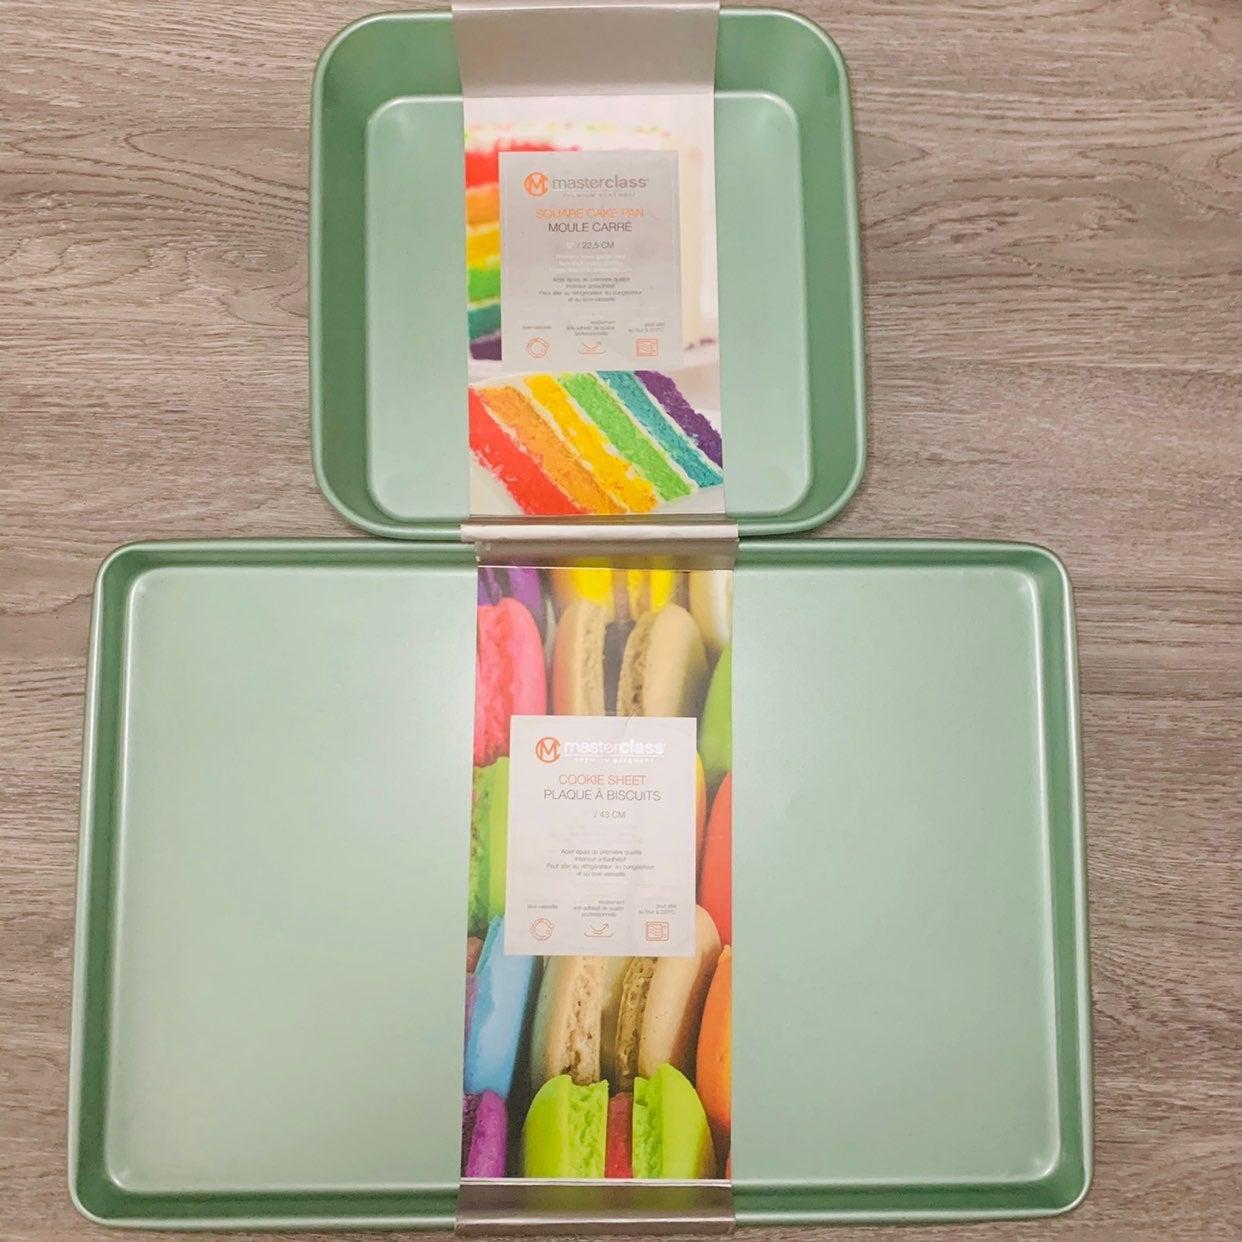 Masterclass Baking Tray Pan Set